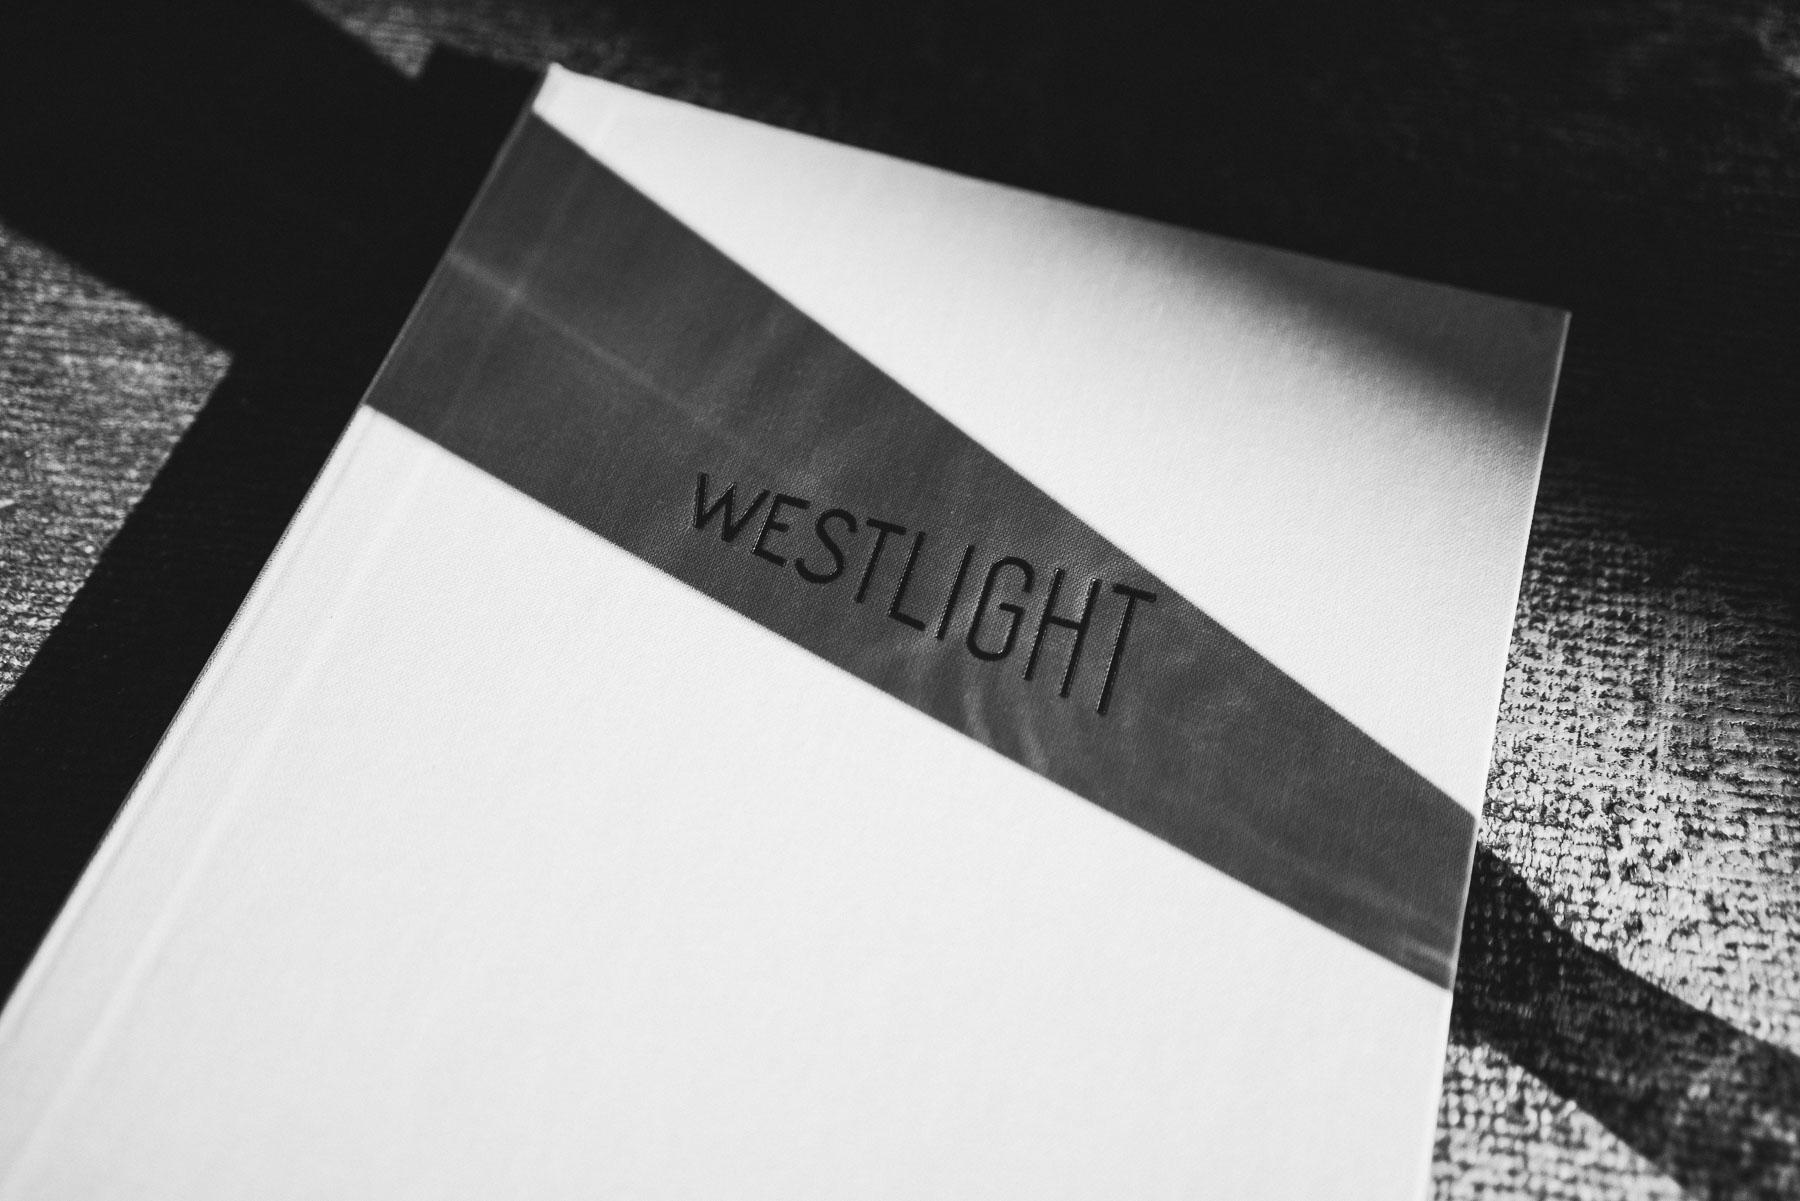 The Westlight restaurant's menu, Brooklyn, New York.